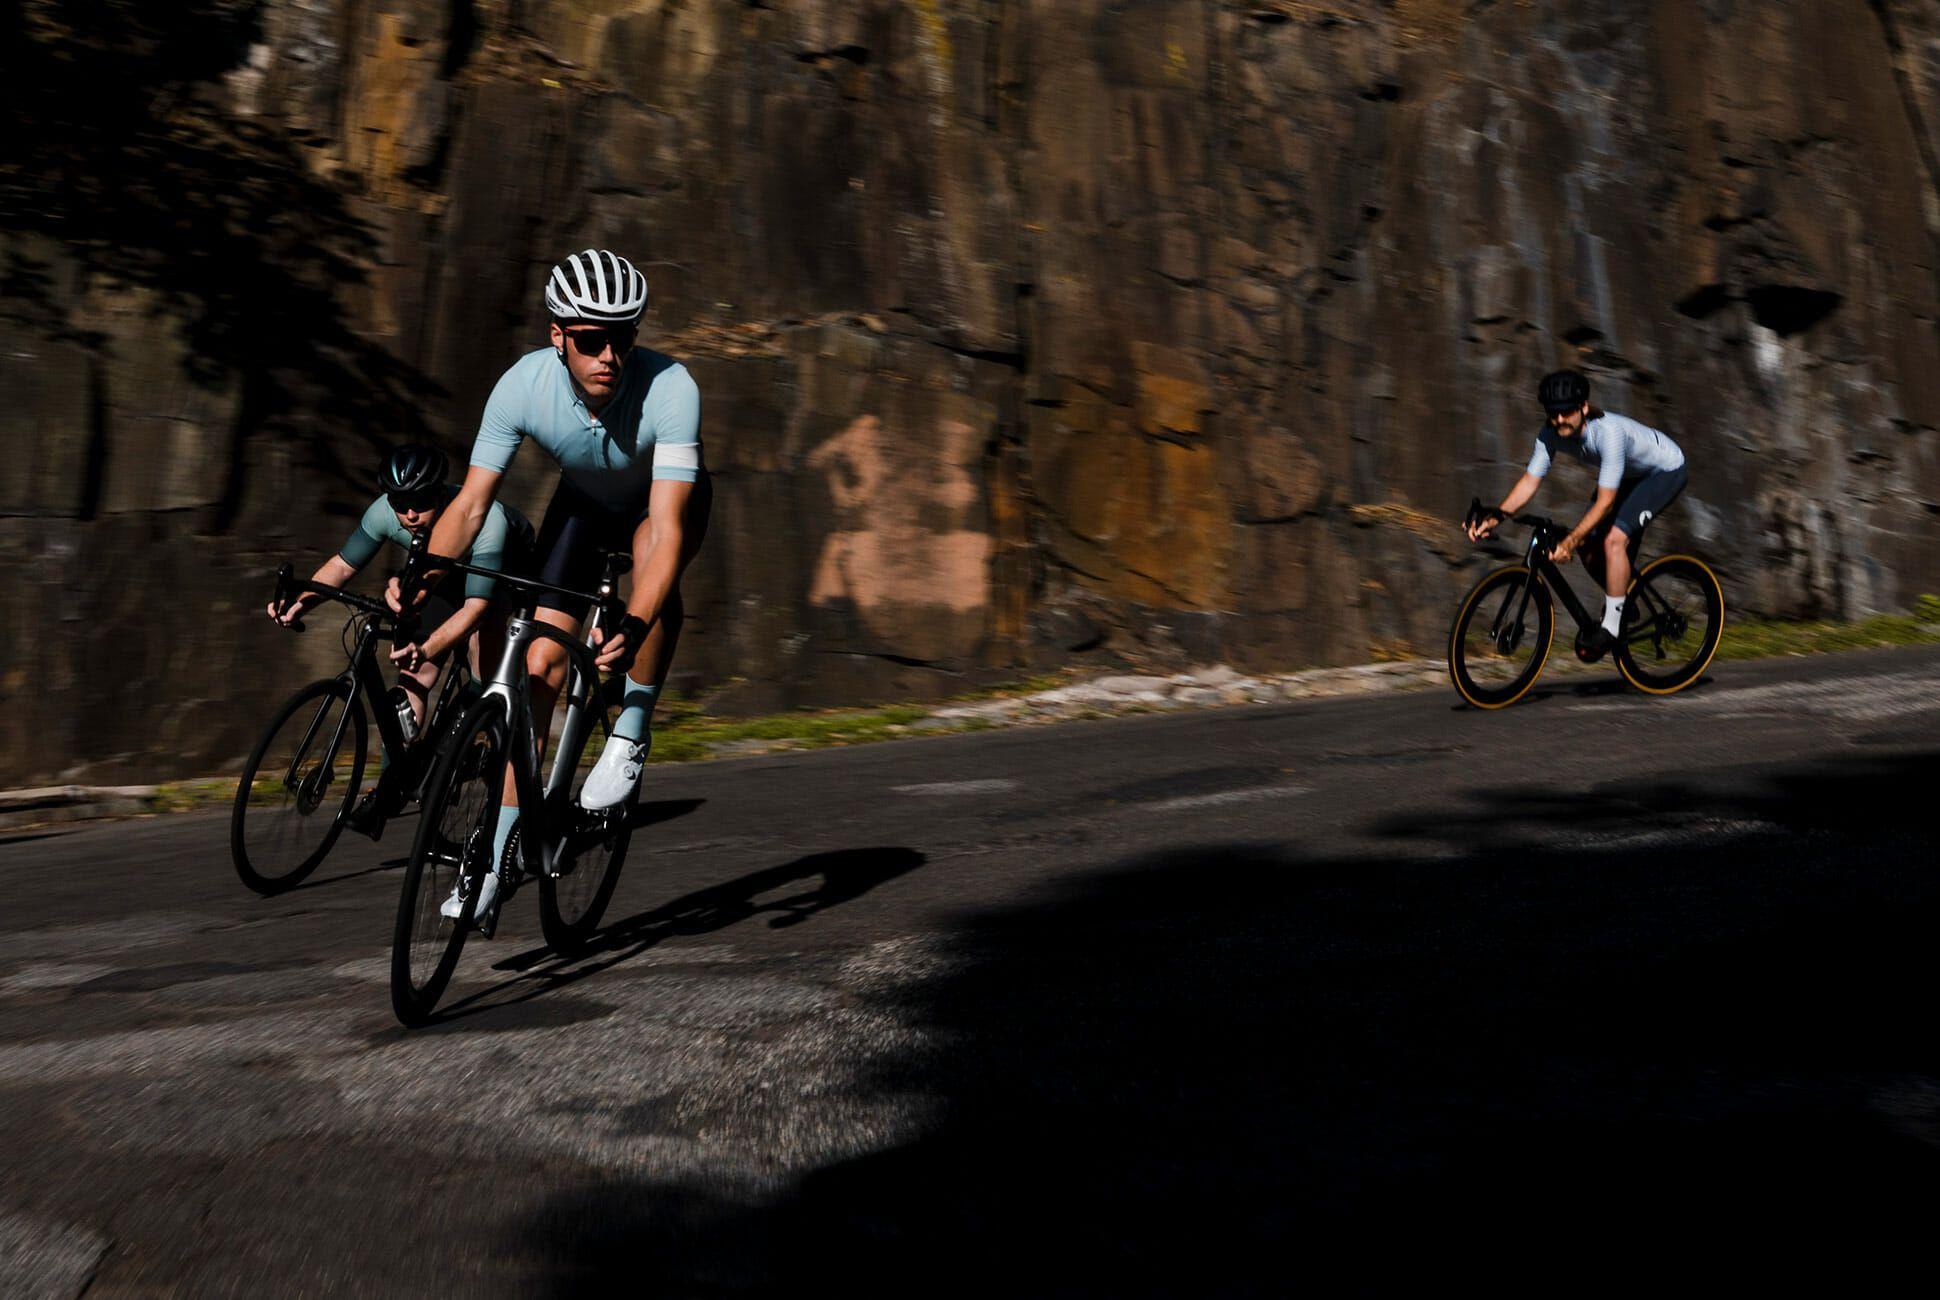 Summer-Cycling-Kits-2018-gear-patrol-af-slide-2